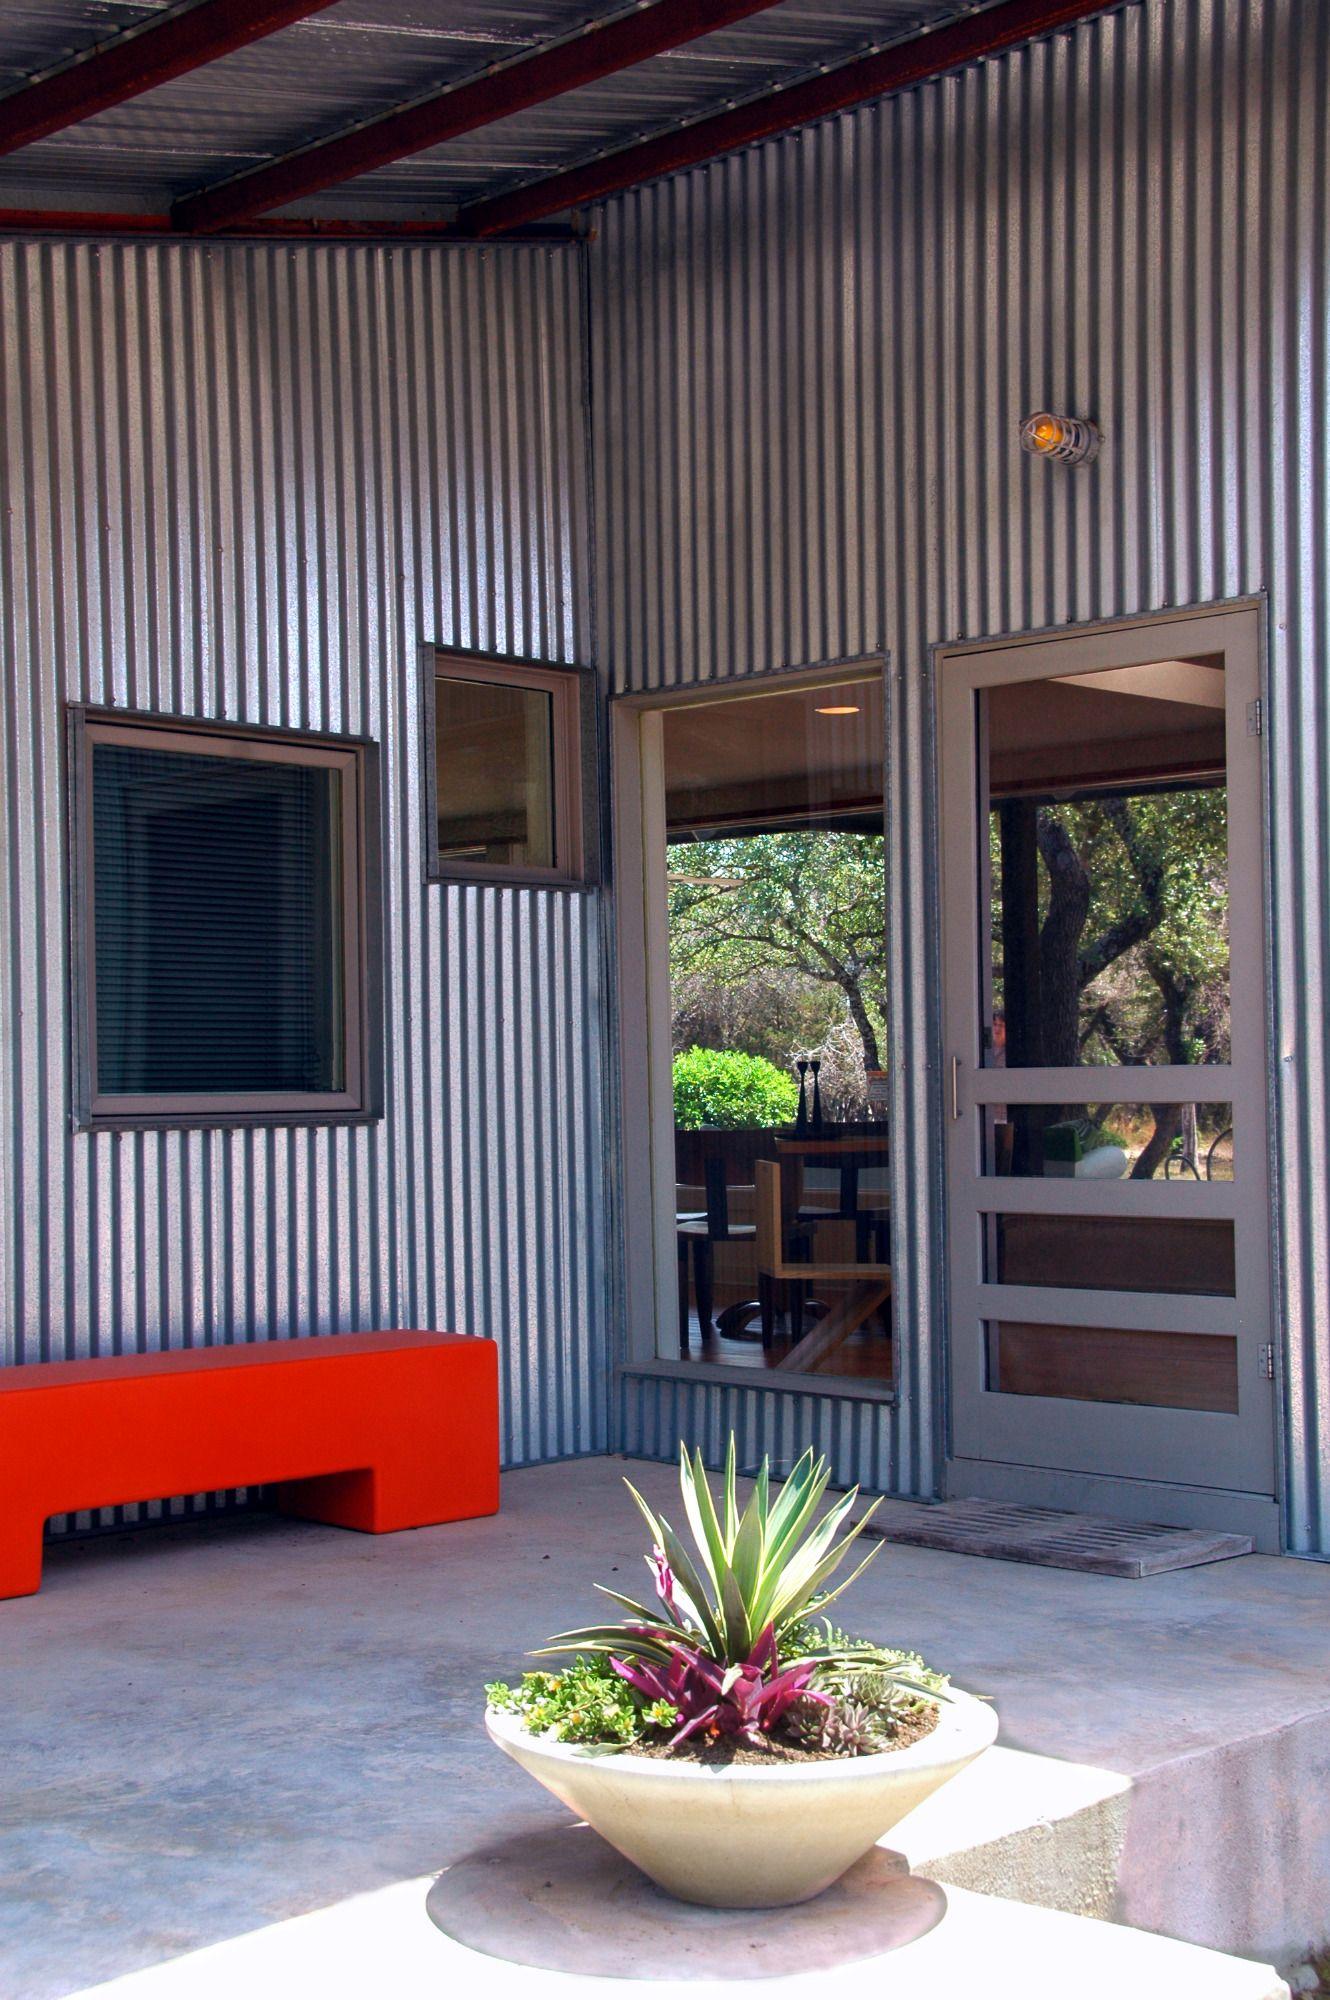 Nick Deaver Walkabout Corrugated metal siding Modern exteri